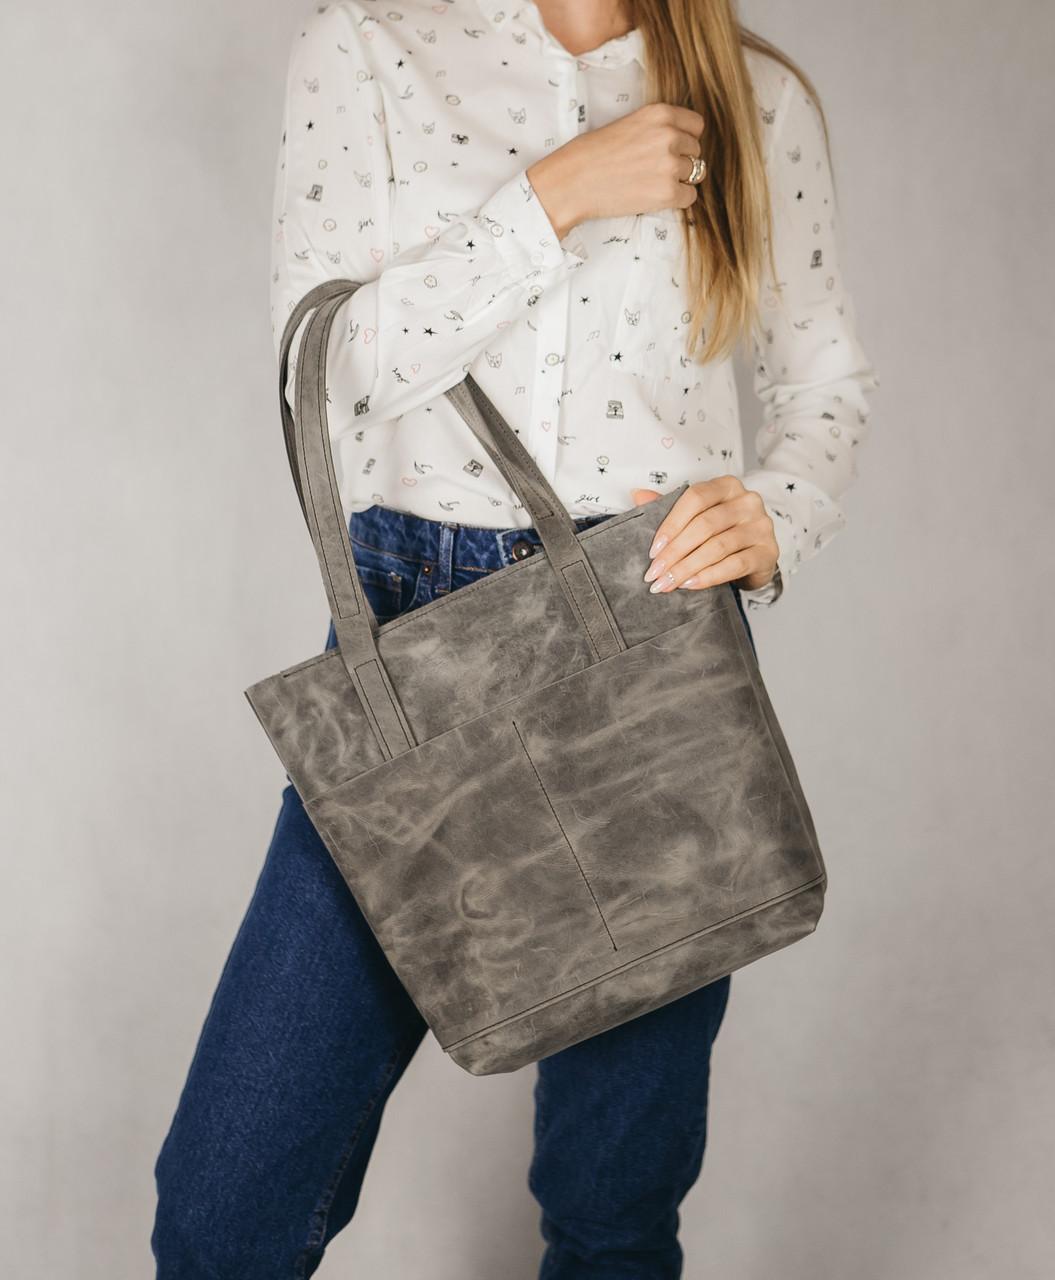 114744684656 Сумка из кожи BigPo ручной работы, сумка женская, жіноча сумка зі шкіри -  Blue